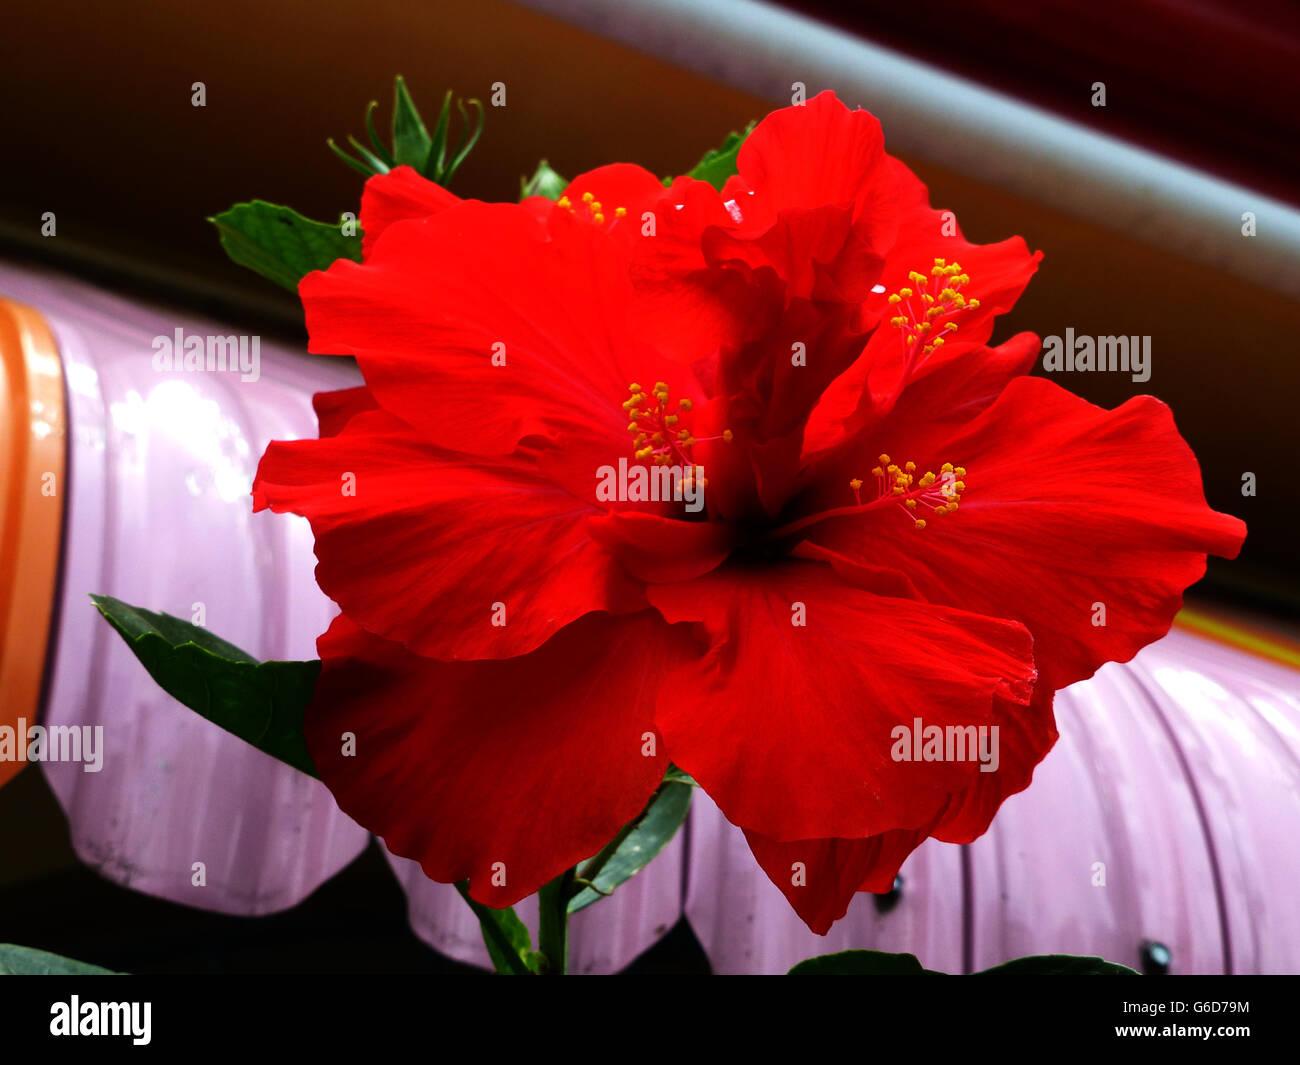 Hibiscus jamaica stock photos hibiscus jamaica stock images alamy hibiscus flower very popular in many varieties right across jamaicaobably the izmirmasajfo